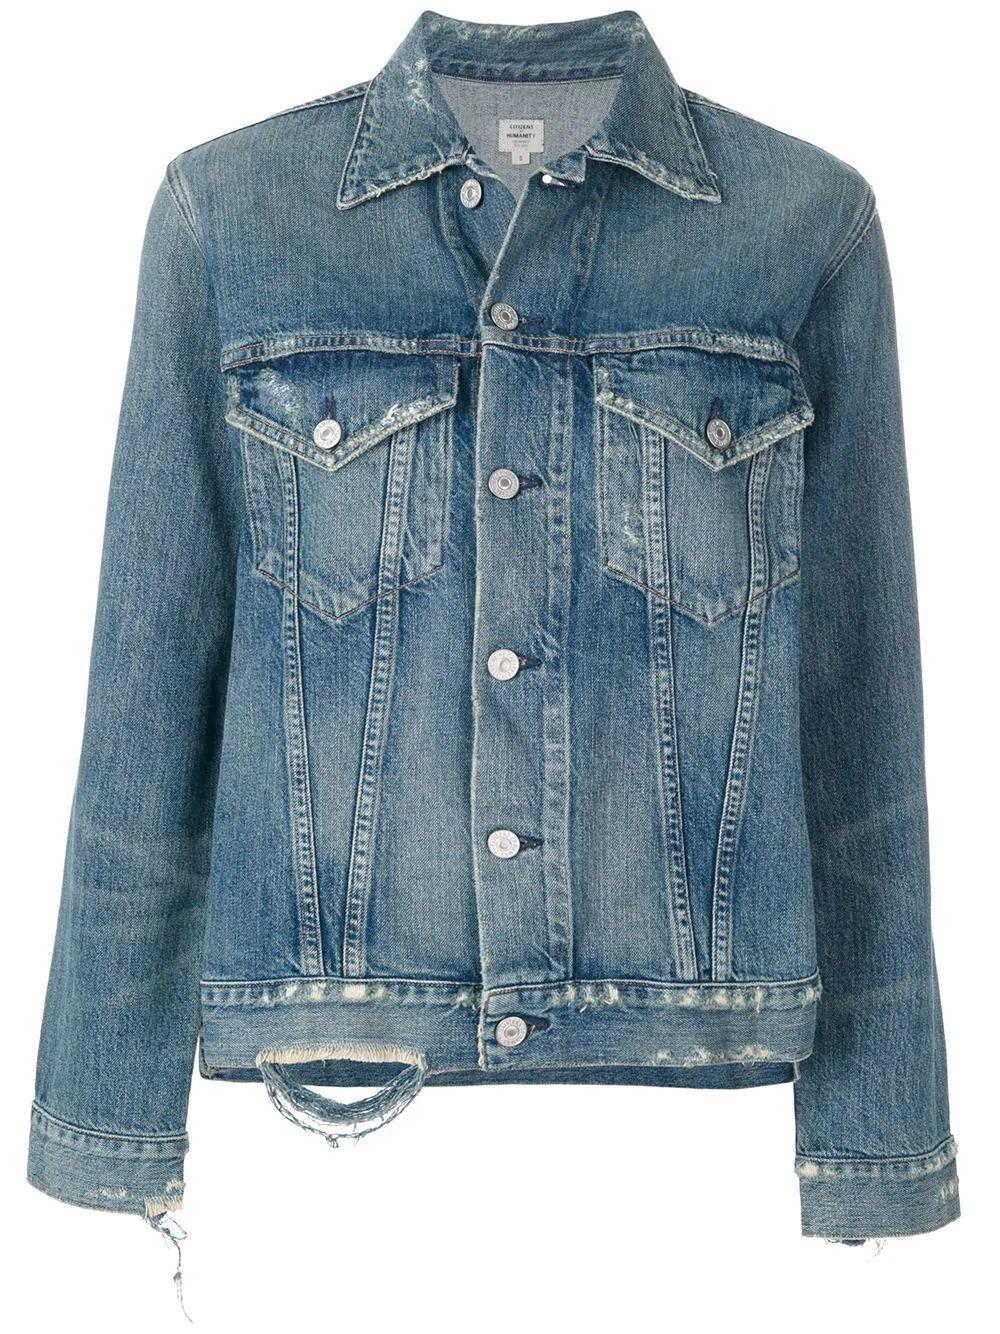 Crista Distressed High Low Denim Jacket Item # 600-763